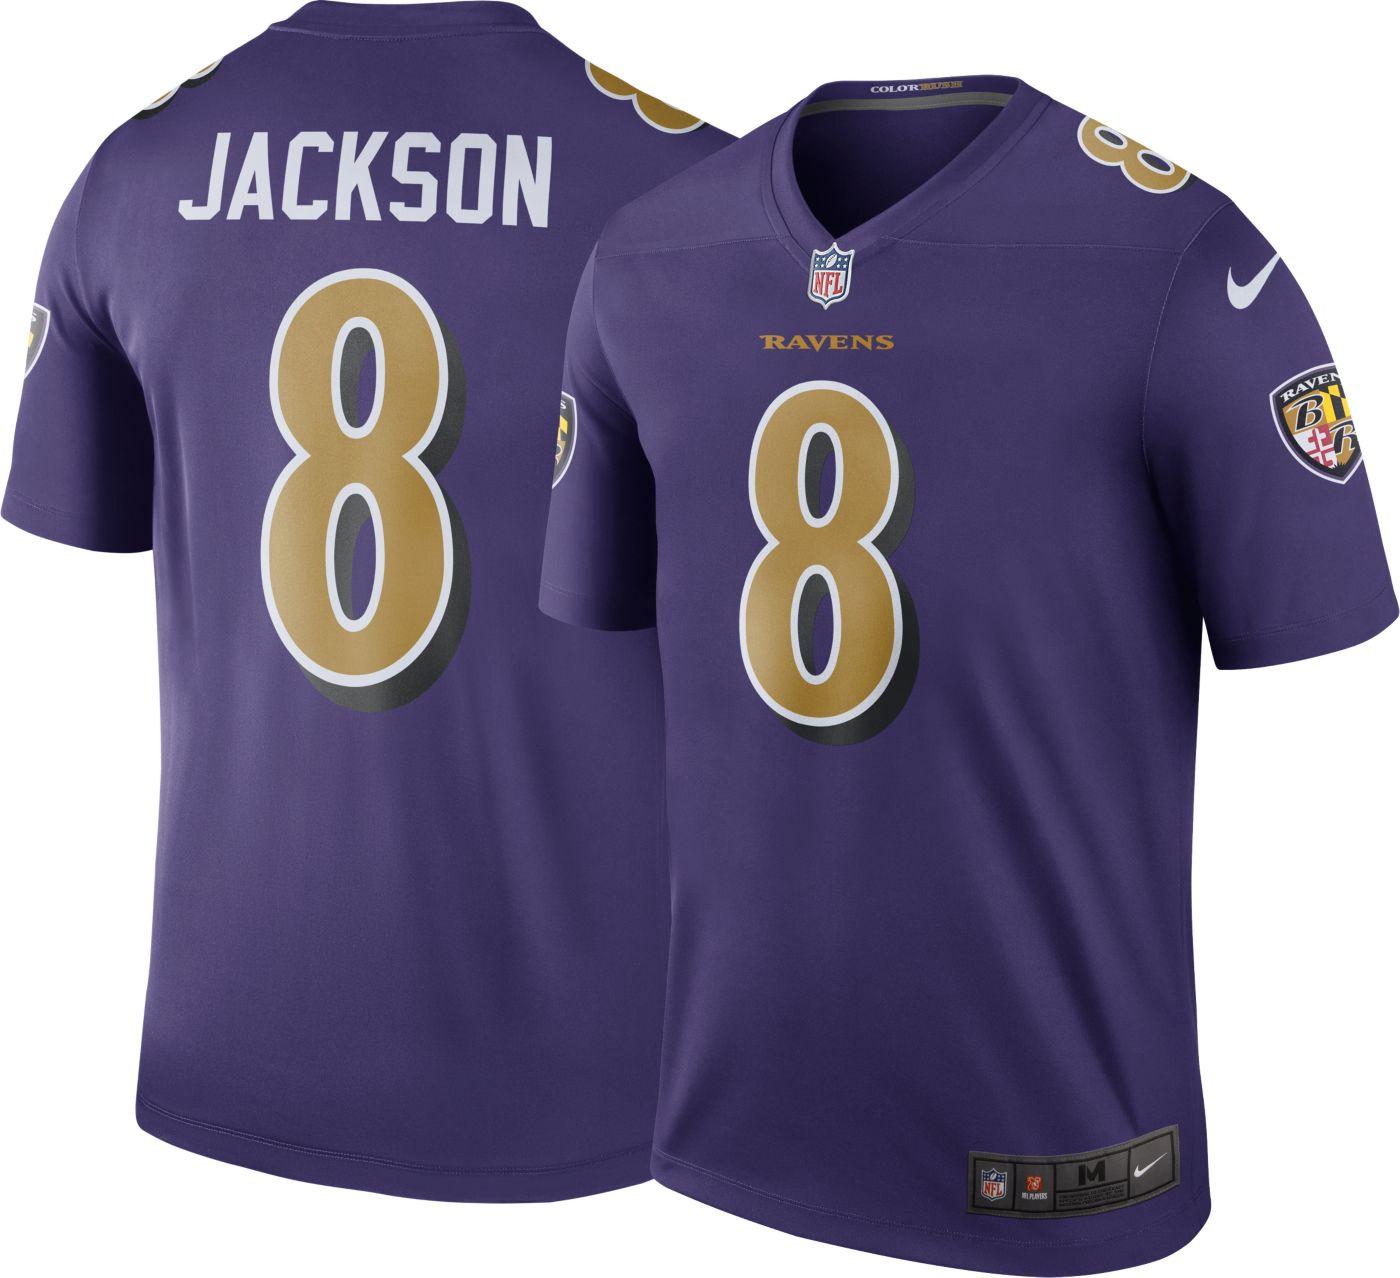 Nike Men's Color Rush Legend Purple Jersey Baltimore Ravens Lamar Jackson #8